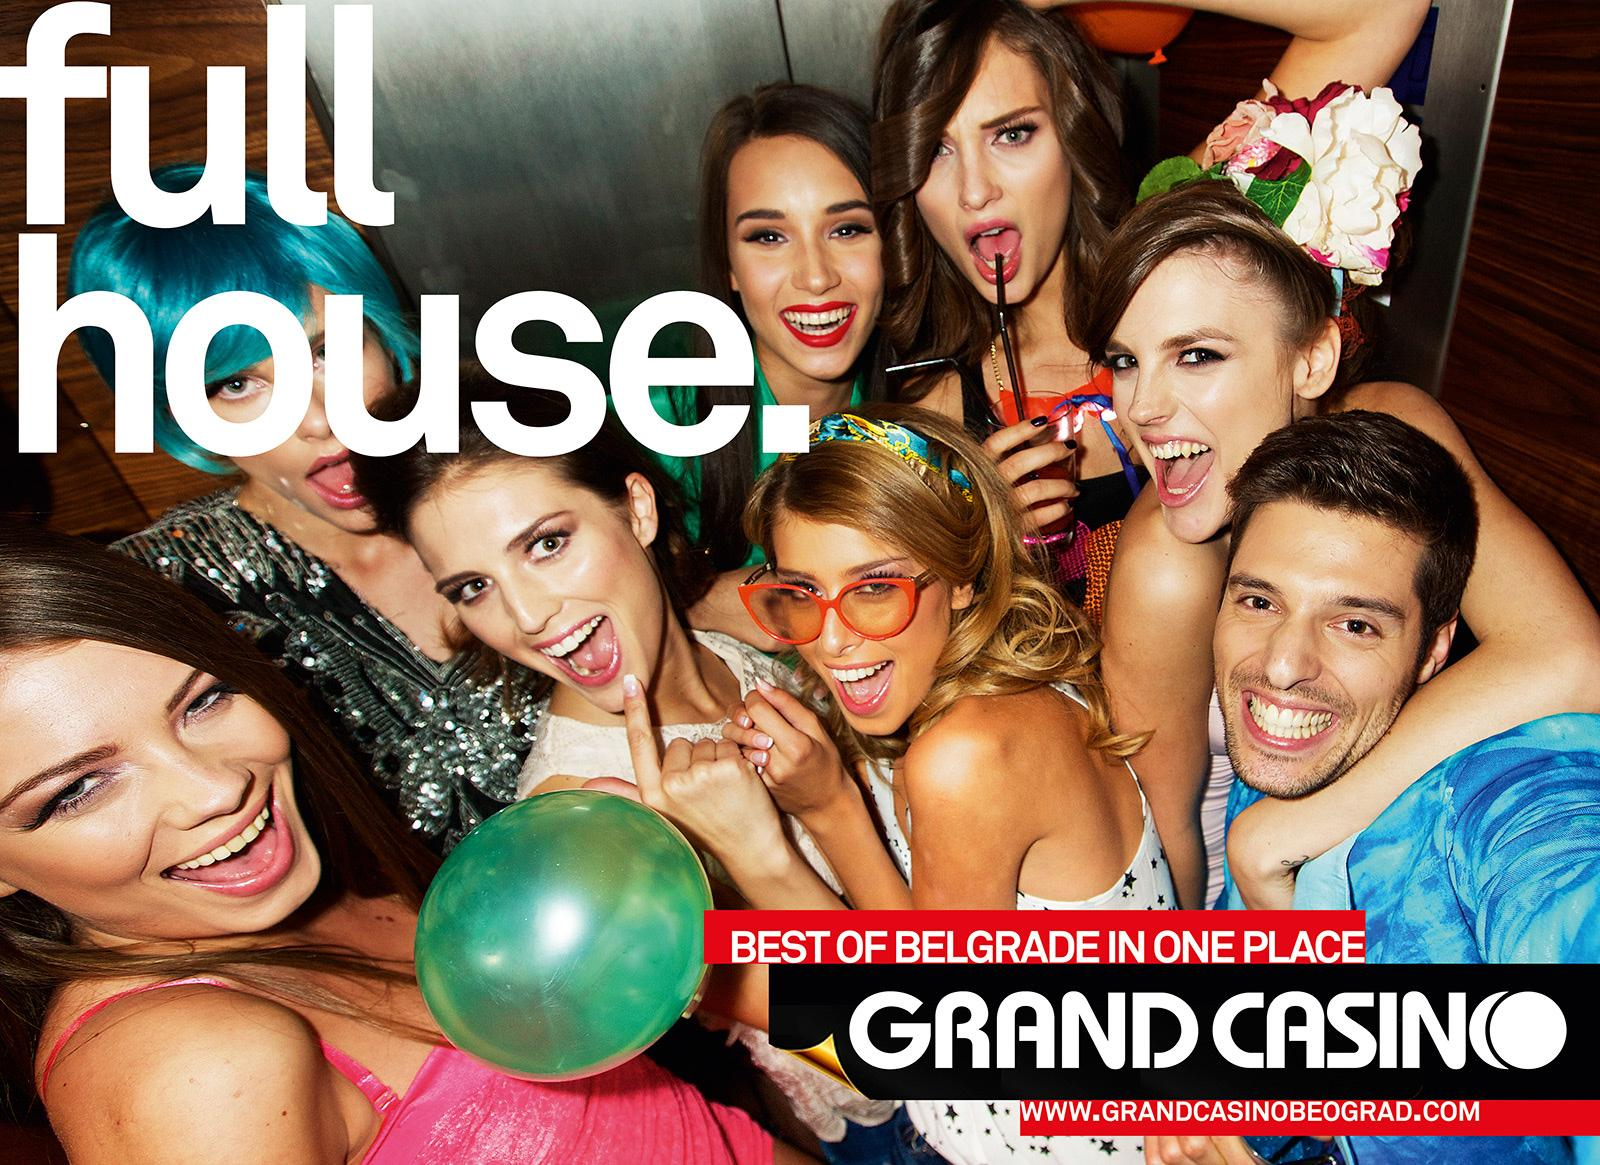 Grand Casino Beograd Print Ad -  Full house